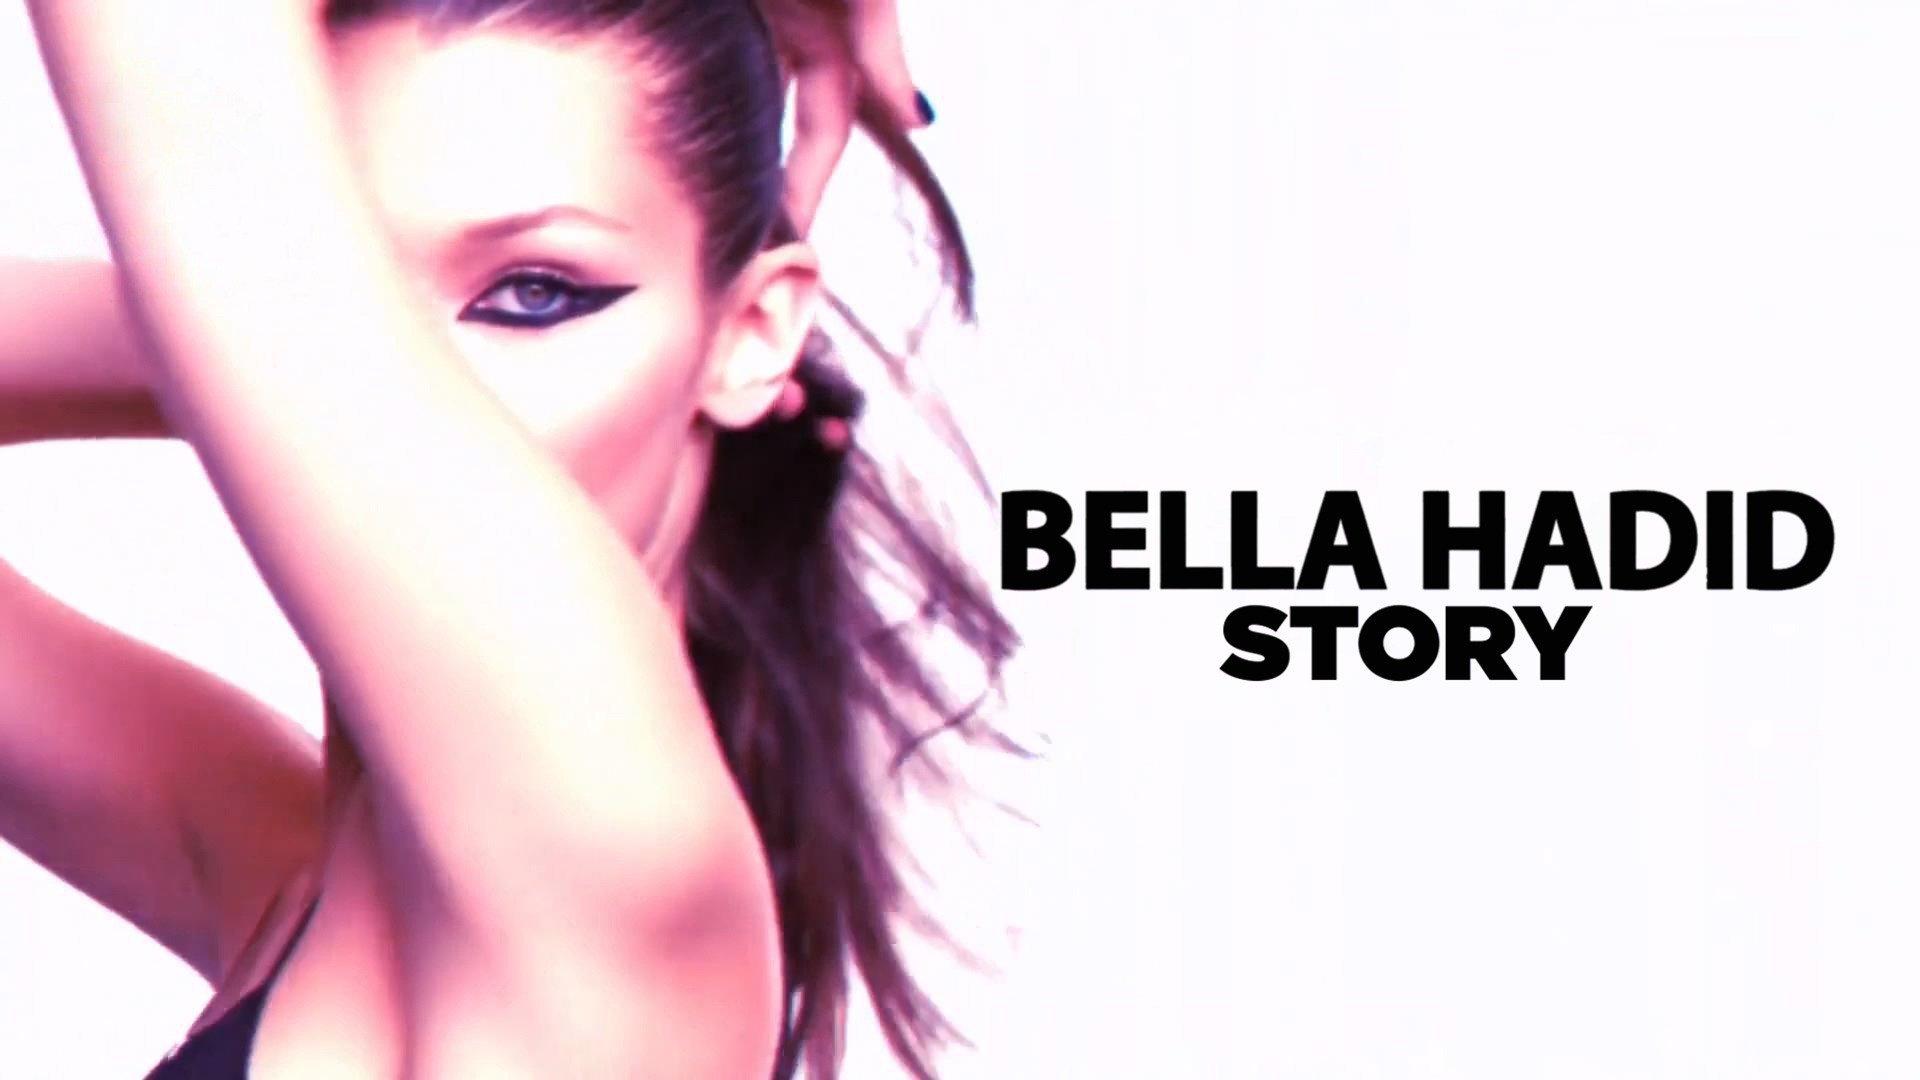 Bella Hadid Story